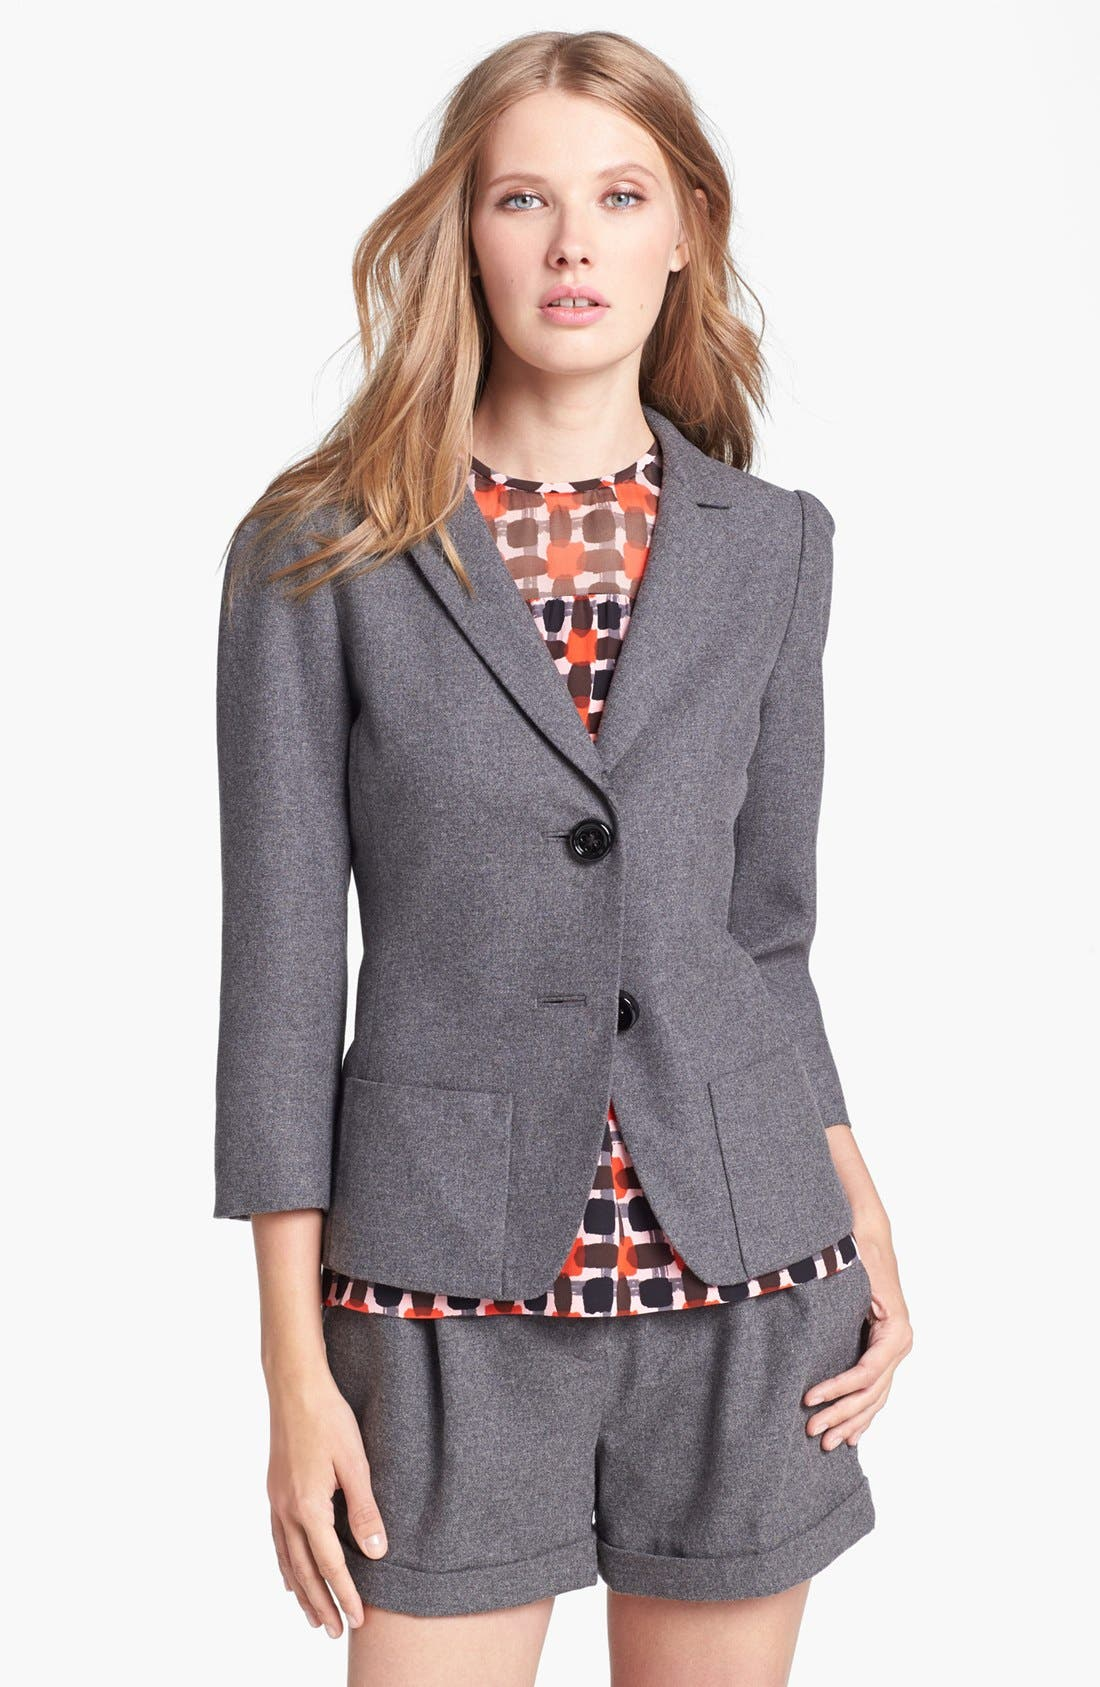 Alternate Image 1 Selected - kate spade new york 'melita' wool blend jacket